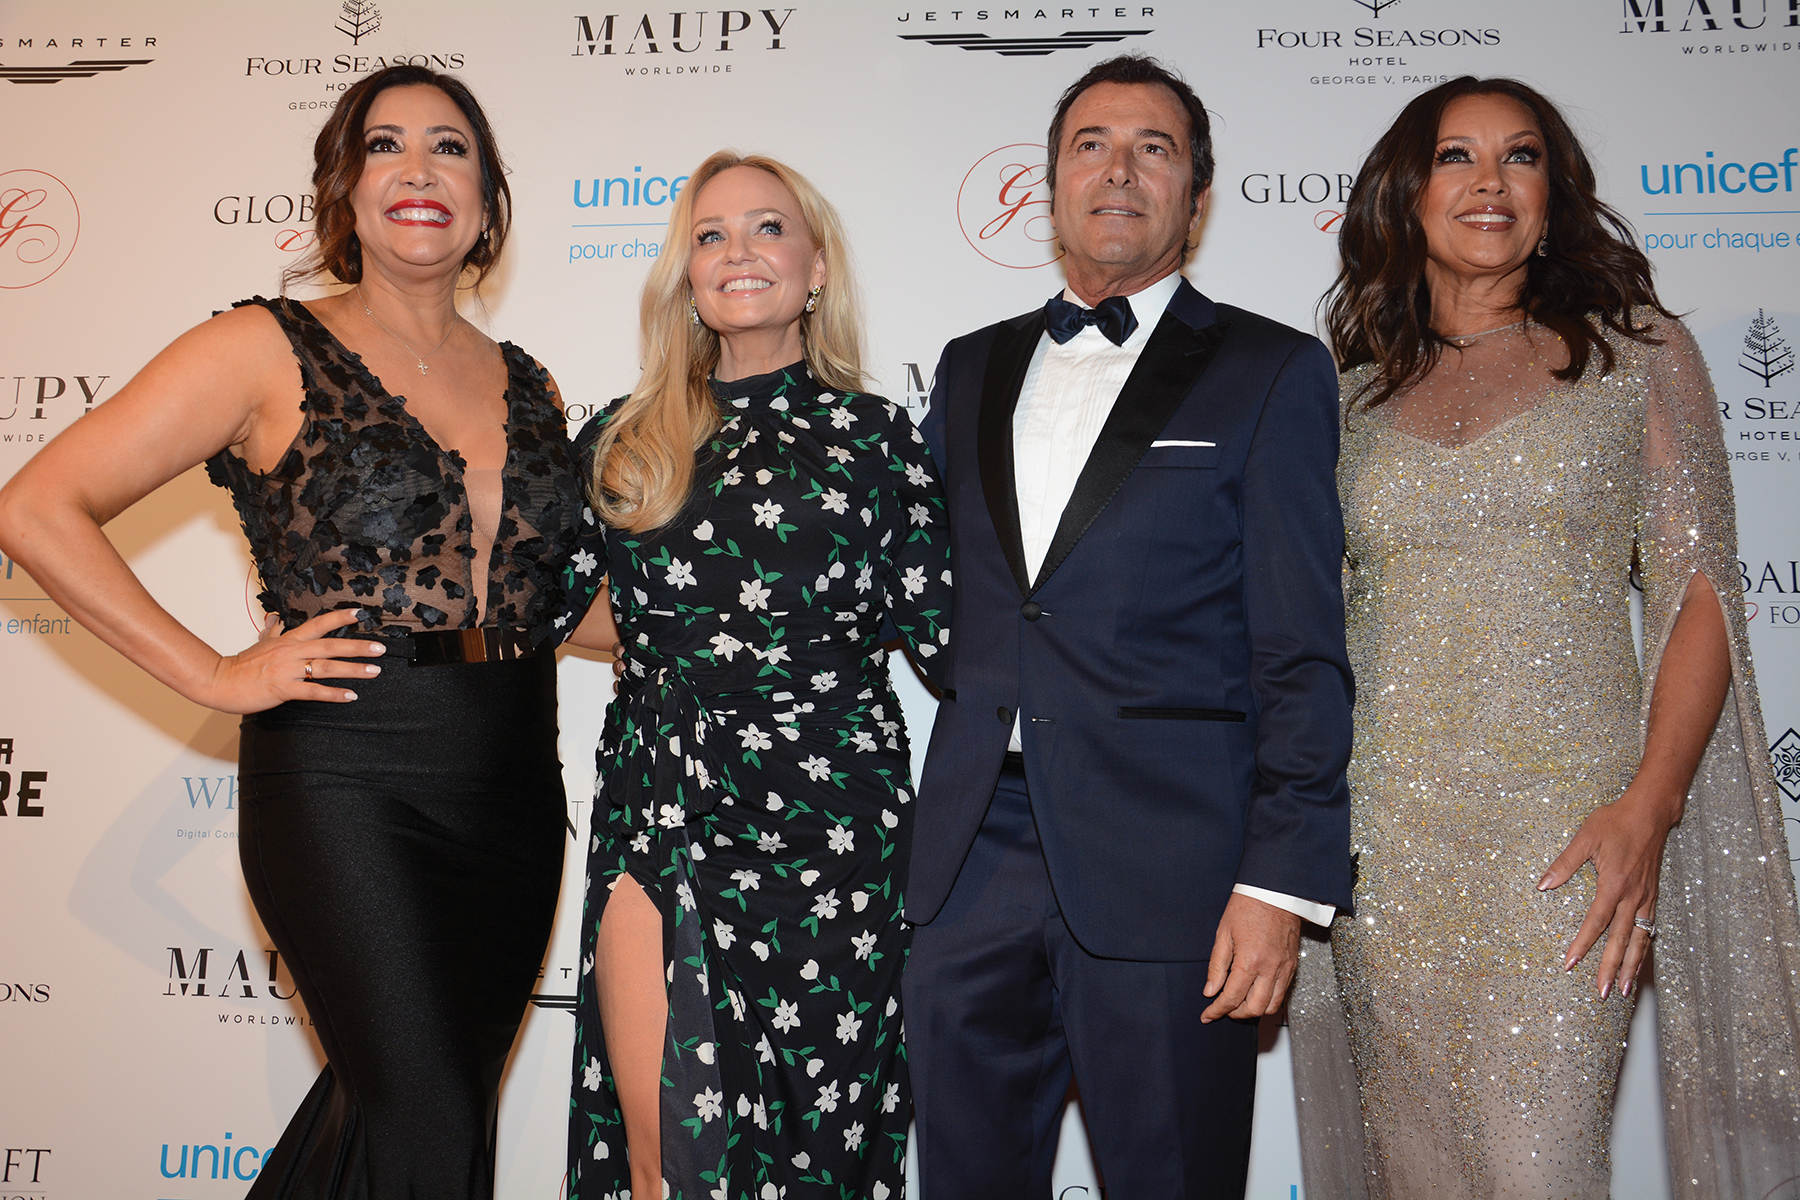 María Bravo (Chair and CEO Global Gift Foundation), Emma Bunton (Global Gift Ambassador), Bernard Montiel and Vanessa Willians (Honorary Chair)